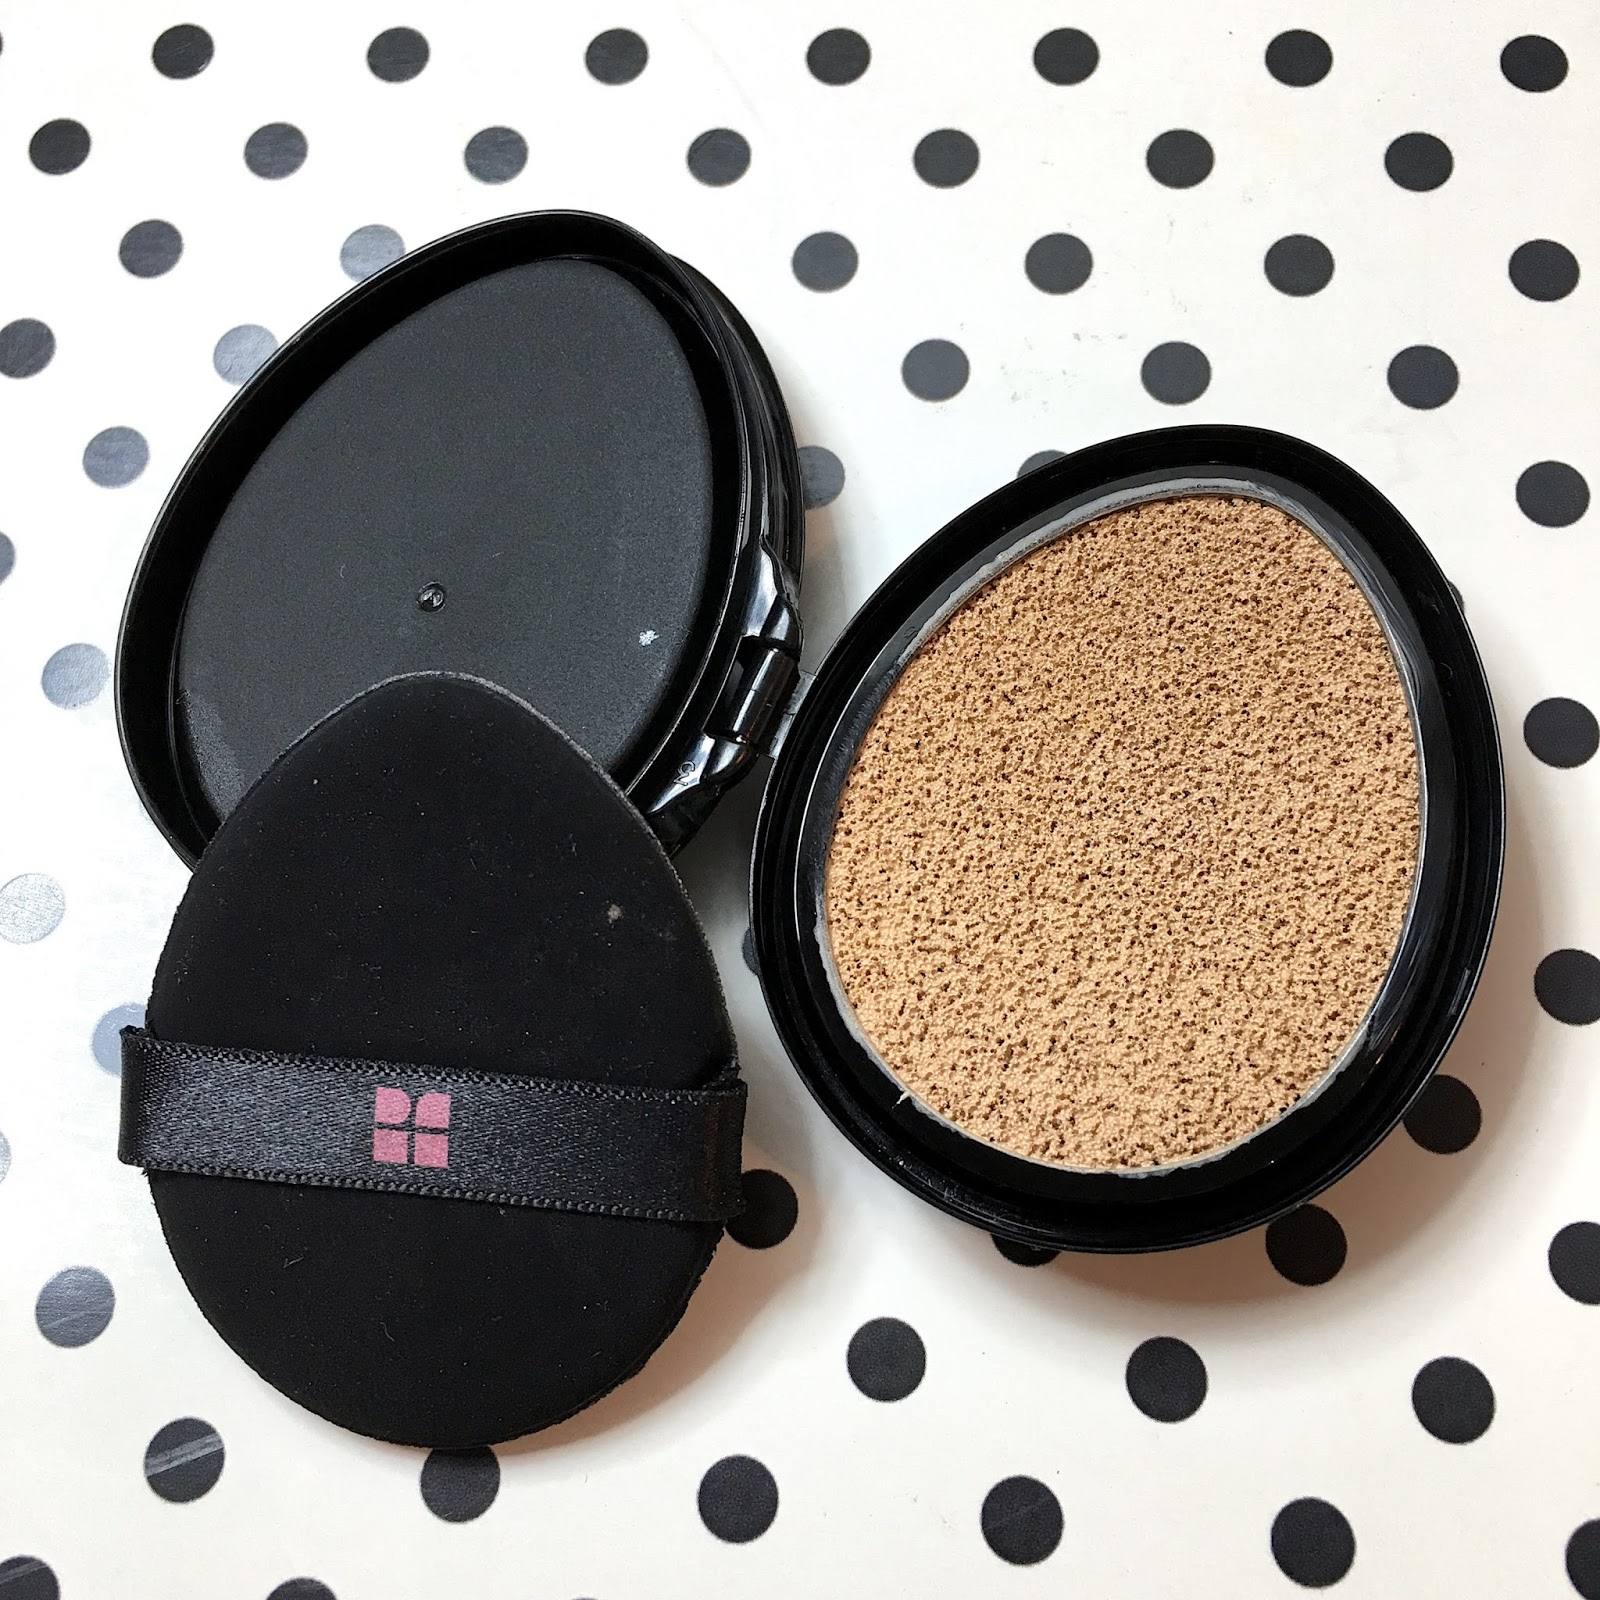 Makeup Secret: 日本 No.1 大熱 FLOWFUSHI「ION de Cushion Foundation」氣墊粉底 review